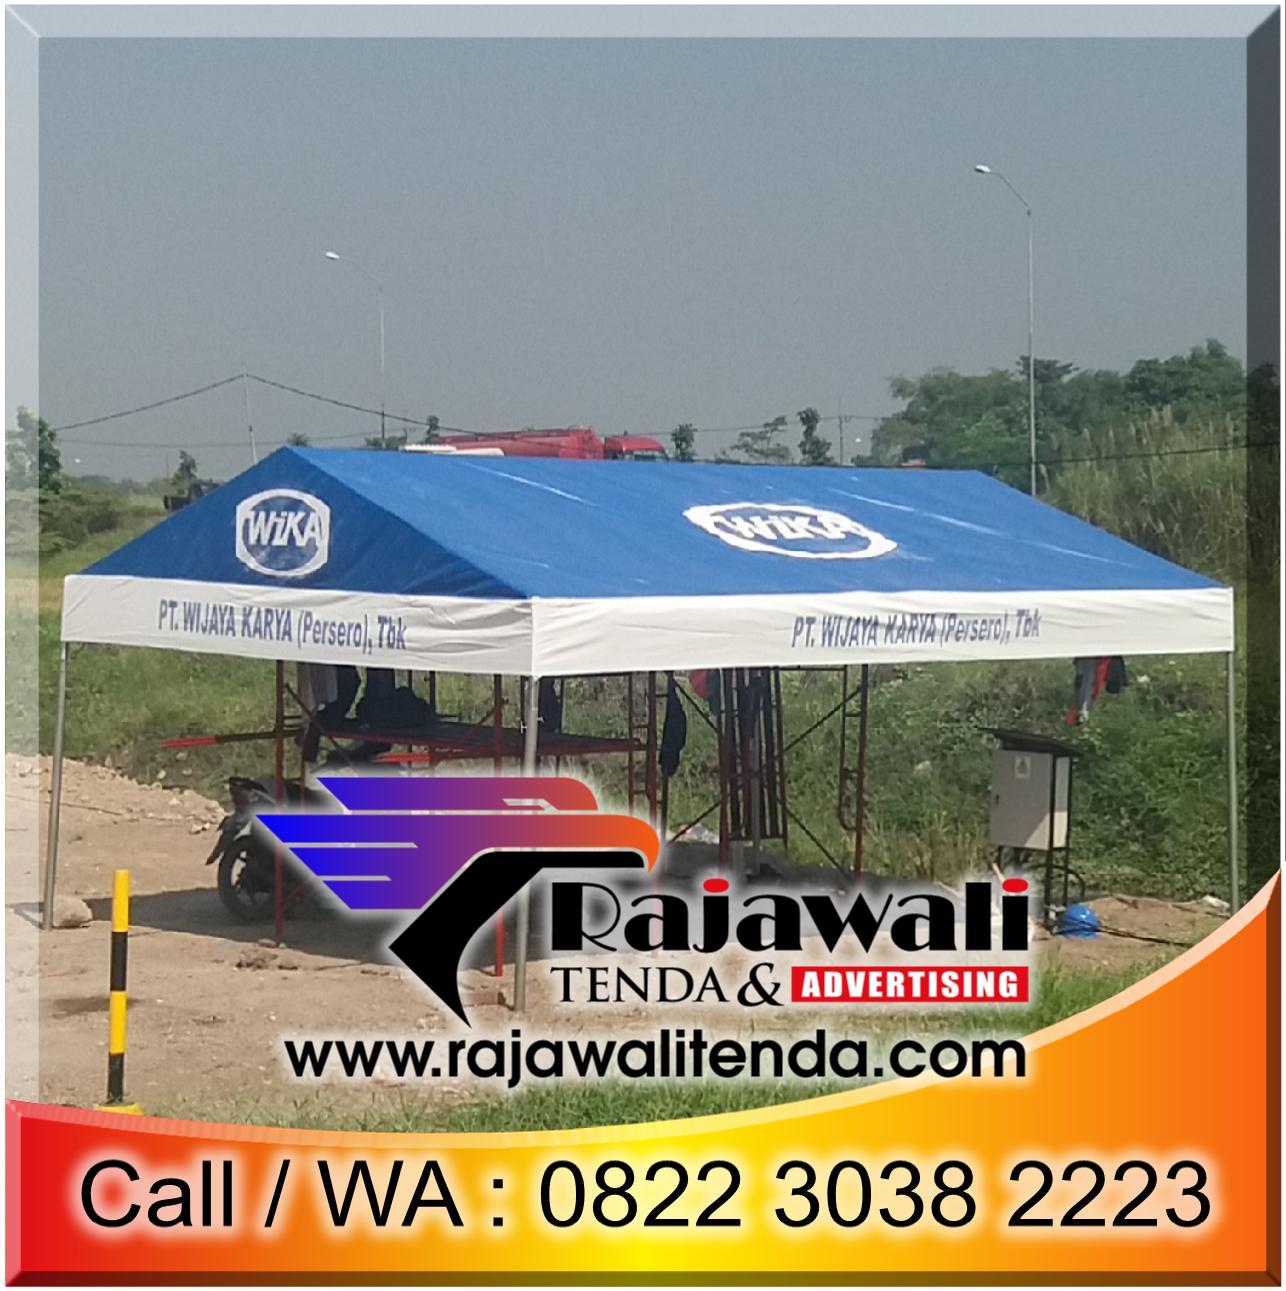 Tenda proyek , jual tenda proyek, harga tenda proyek , tenda proyek murah, distributor tenda proyek , supplier tenda proyek , pabrik tenda proyek , agen tenda proyek , tenda proyek indonesia, produsen tenda proyek , tenda proyek kalimantan, tenda proyek banjarmasin, tenda proyek balikpapan, tenda proyek pontianak, tenda proyek samarinda, tenda proyek palangkaraya, tenda proyek sulawesi, tenda proyek makassar, tenda proyek manado, tenda proyek palu, tenda proyek kendari, tenda proyek gorontalo, tenda proyek bali, tenda proyek denpasar bali, tenda proyek denpasar, tenda proyek buleleng, tenda proyek gianyar, tenda proyek jawa, tenda proyek jawa timur, tenda proyek jawa tengah, tenda proyek jatim, tenda proyek jawa barat, tenda proyek malang, tenda proyek semarang, tenda proyek solo, tenda proyek jogja, tenda proyek magelang, tenda proyek madiun, tenda proyek banyuwangi, tenda proyek jember, tenda proyek ntb, tenda proyek lombok, tenda proyek mataram lombok, tenda proyek mataram, tenda proyek dompu, tenda proyek sumbawa, tenda proyek sumbawa barat, tenda proyek ntt, tenda proyek flores, tenda proyek flores timur, tenda proyek ende, tenda proyek papua, tenda proyek papua barat, tenda proyek sorong, tenda proyek jayapura, tenda proyek merauke, tenda proyek atambua, tenda proyek indonesia, tenda proyek sumatera, tenda proyek sumatra, tenda proyek lampung, tenda proyek medan, tenda proyek aceh, tenda proyek palembang, tenda proyek bengkulu, tenda proyek surabaya, tenda proyek sidoarjo, tenda proyek gresik